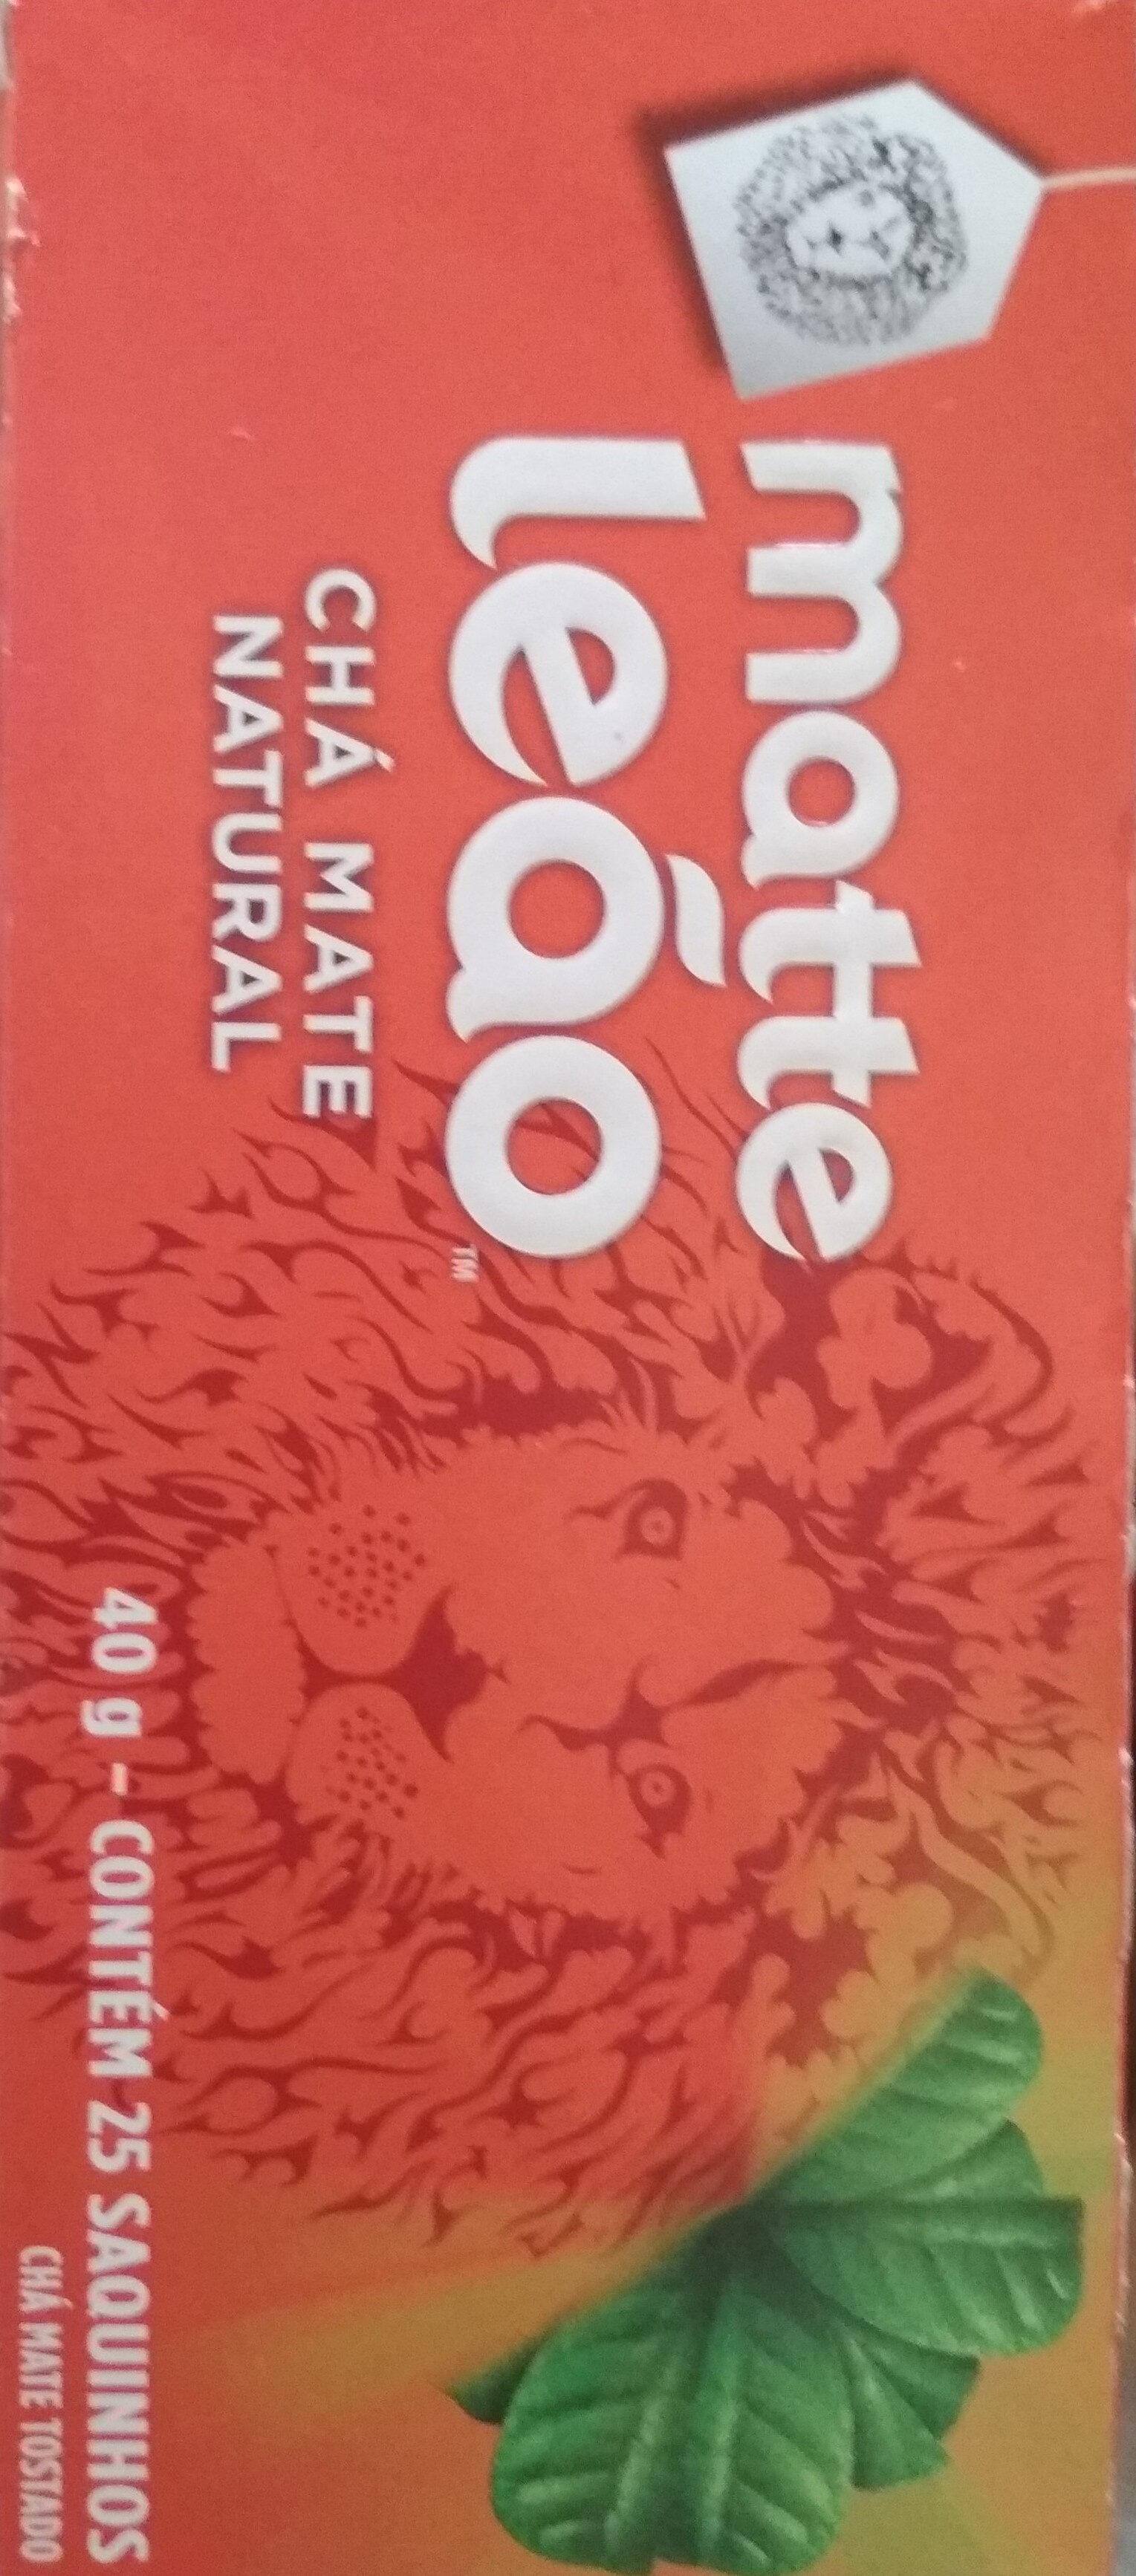 Leao Matte Tea Natural 25G - Produto - pt